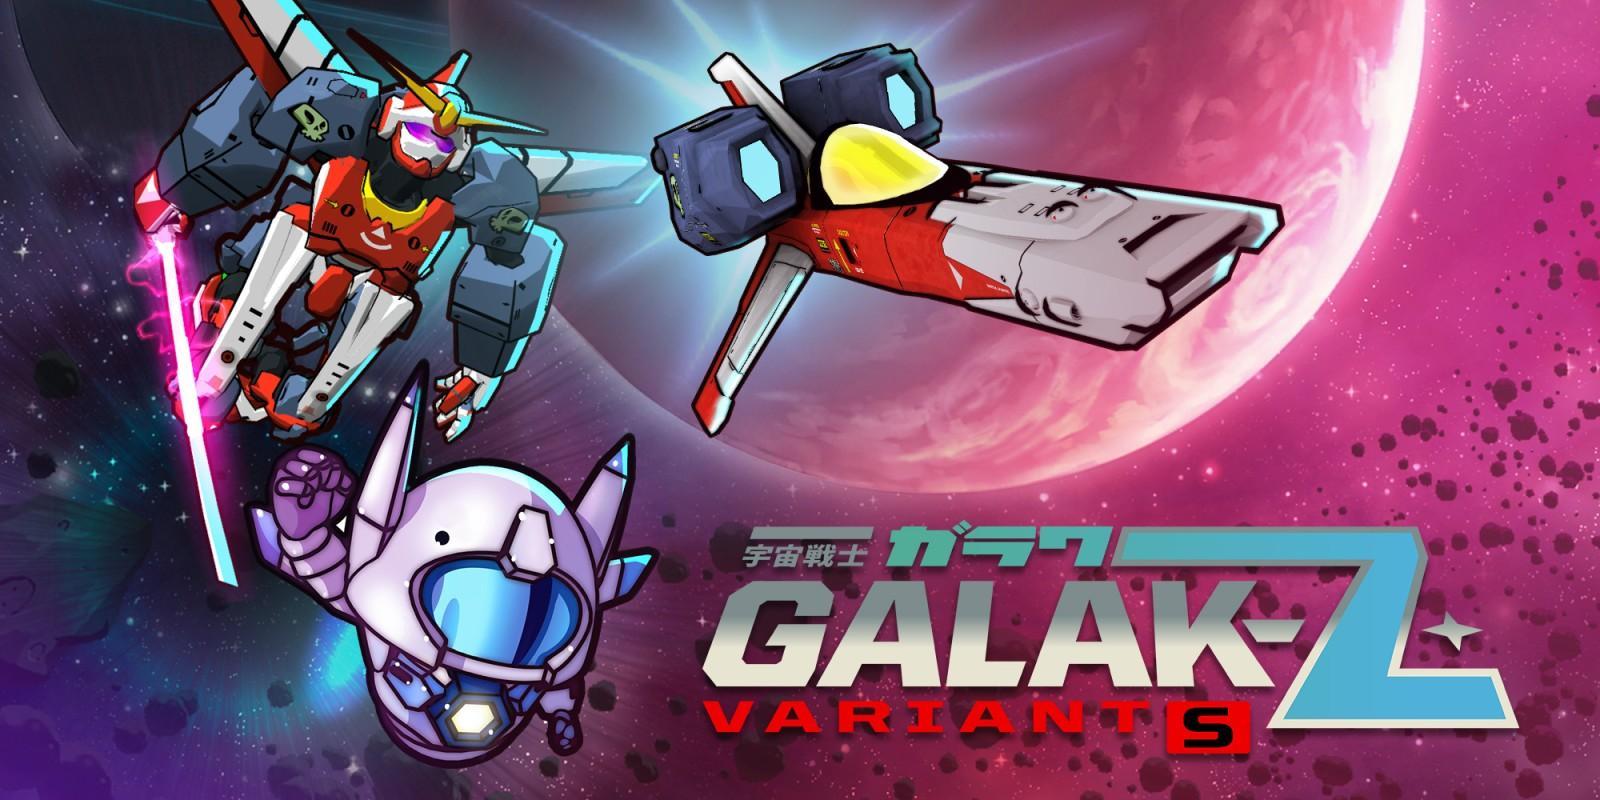 GALAK-Z - Mejores juegos gratis para Nintendo Switch